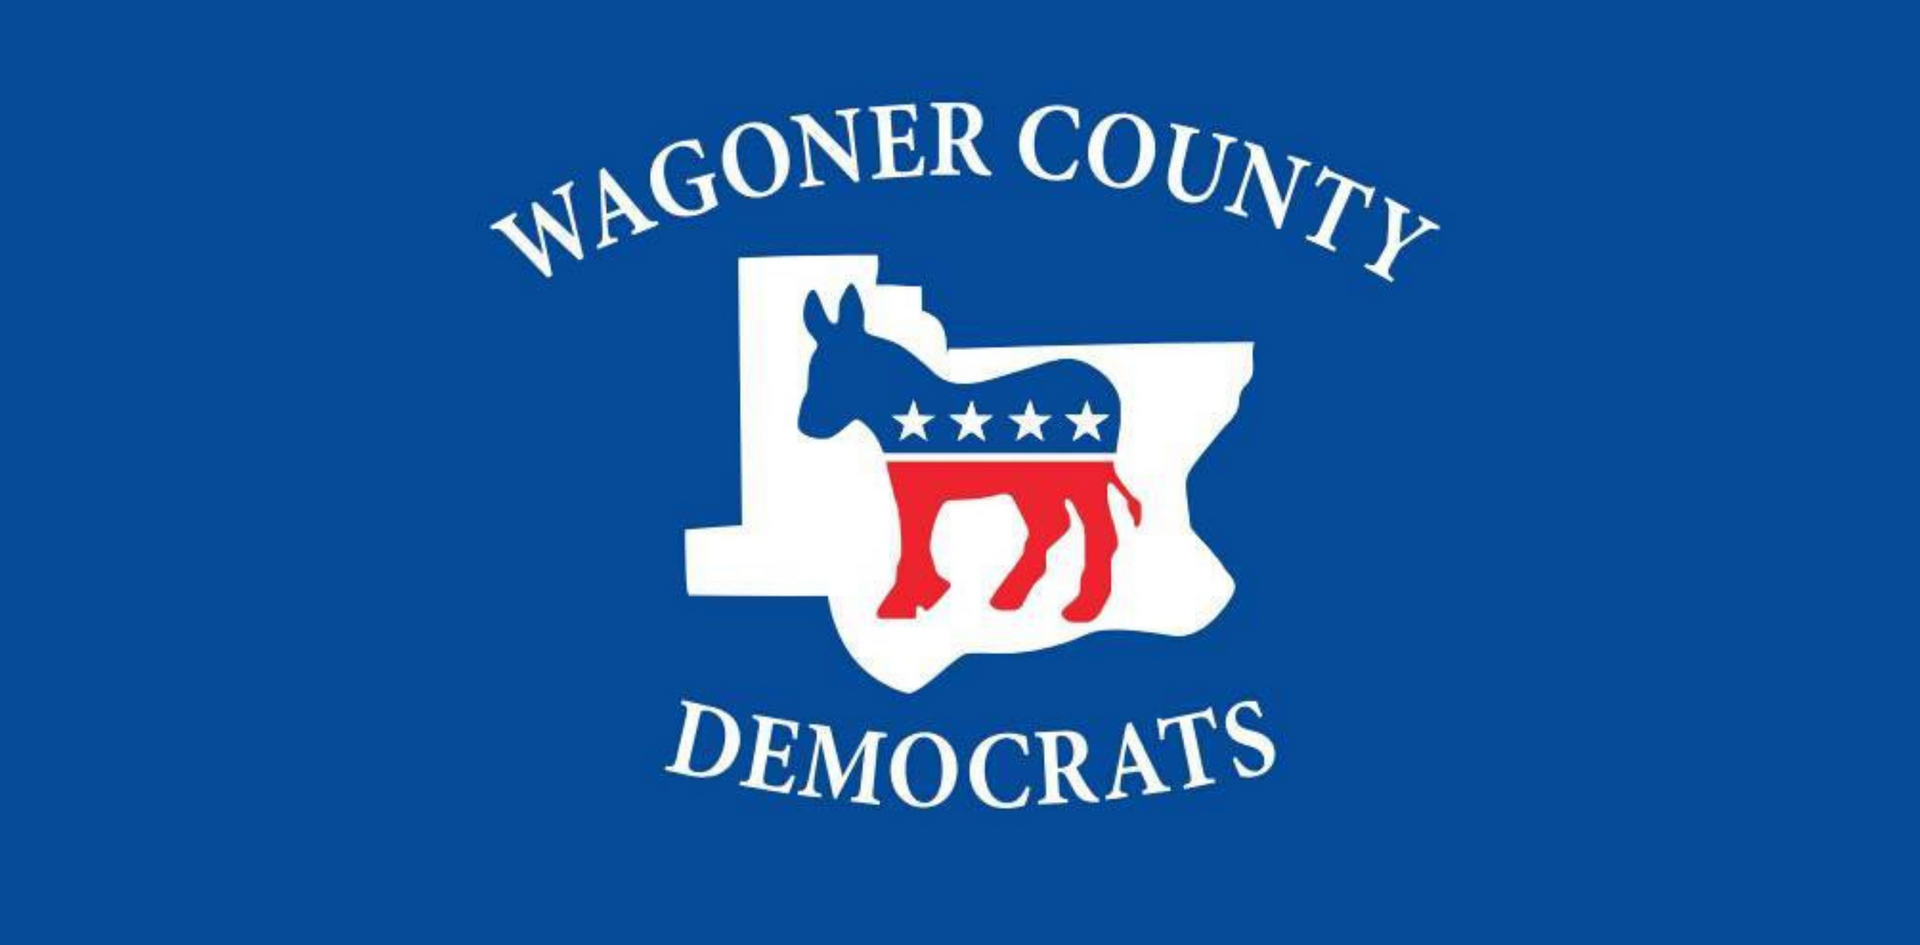 Wagoner County Democratic Party Facebook Page